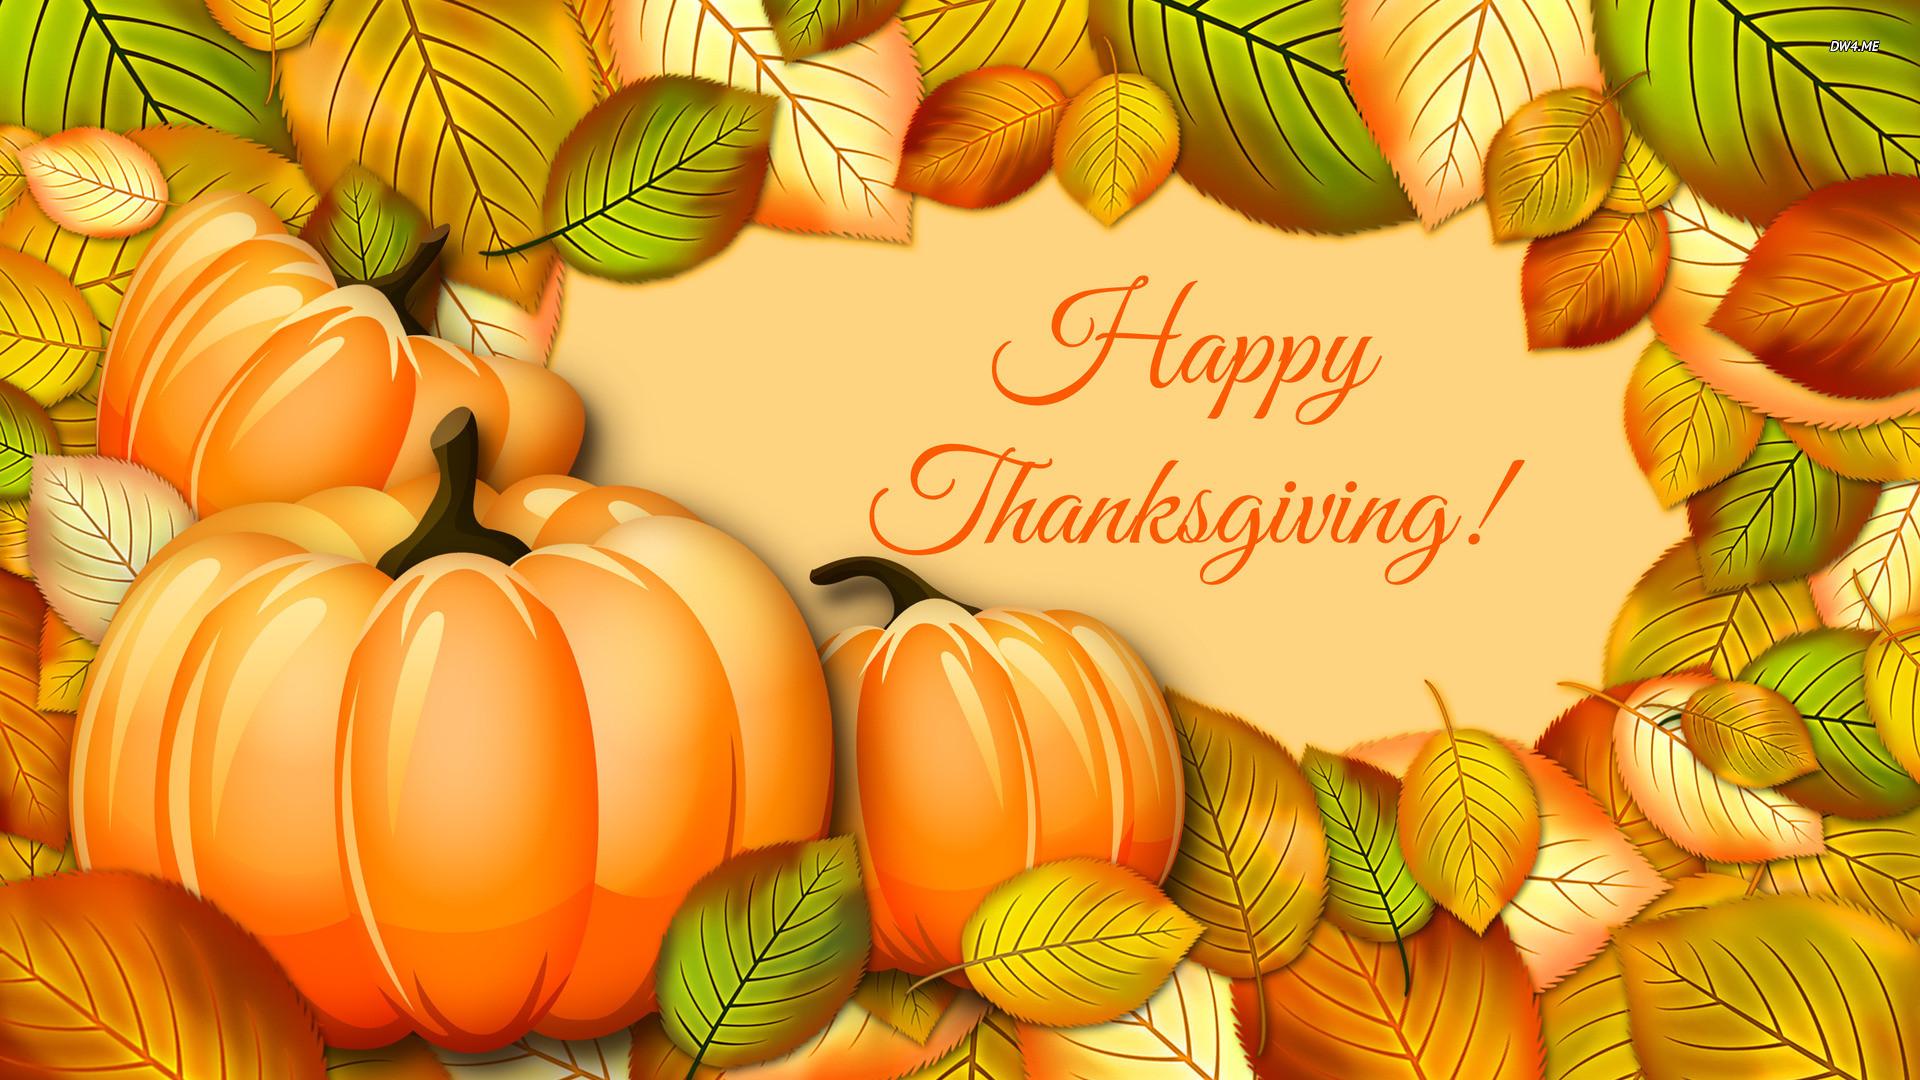 Thanksgiving Wallpaper HD Free Download. Thanksgiving Wallpaper HD. Thanksgiving  Wallpaper Widescreen. Happy Thanksgiving Desktop Background